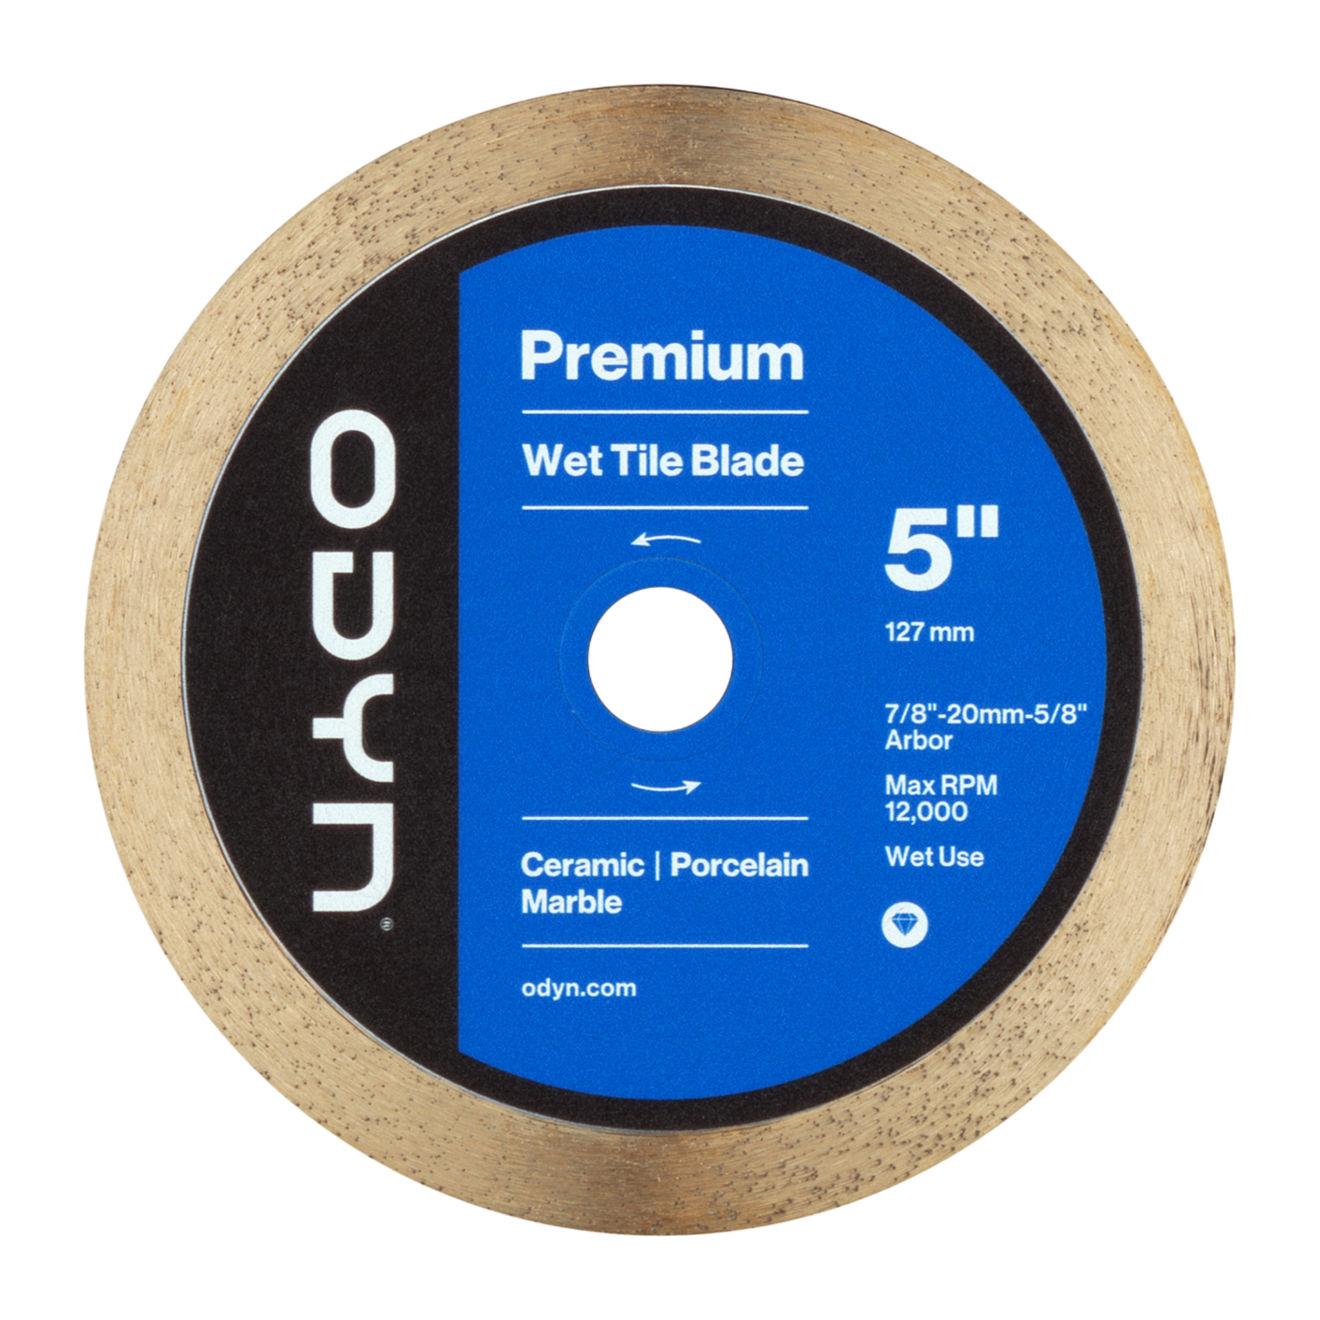 Odyn 5 in. Premium Wet Tile Blade